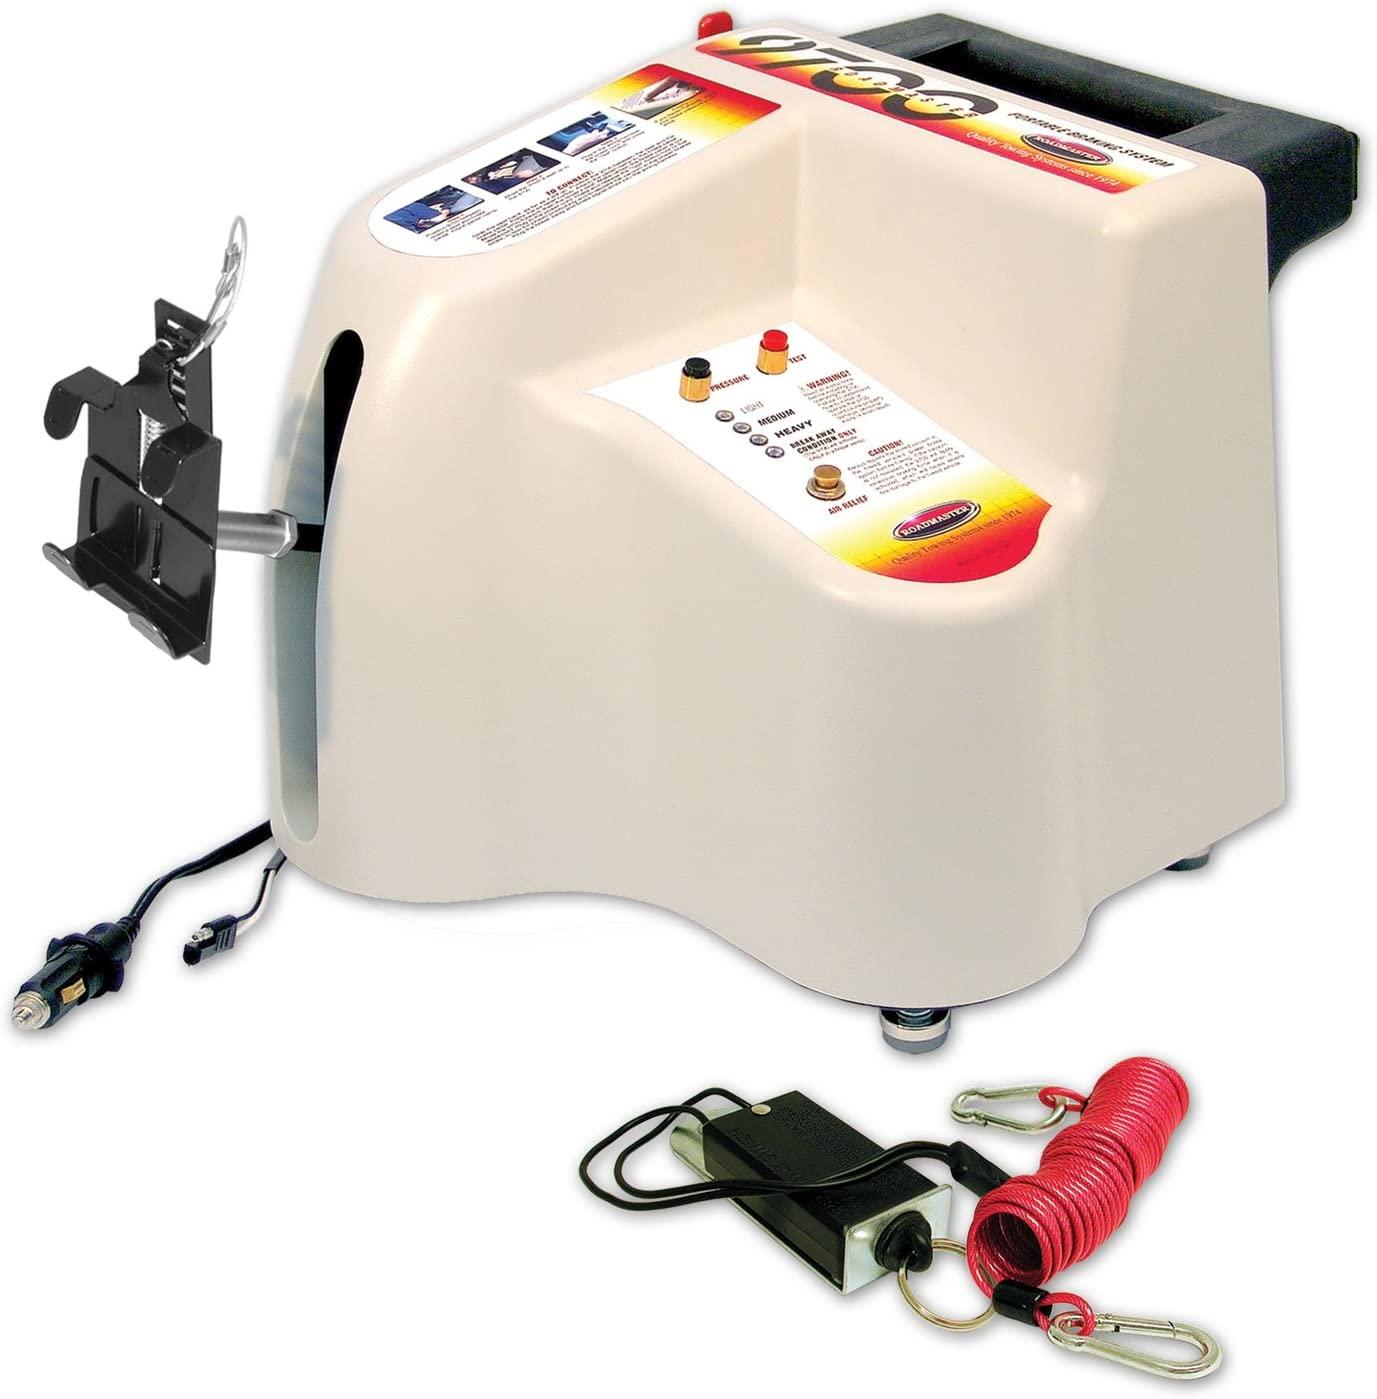 Roadmaster 9700 Supplemental Braking System